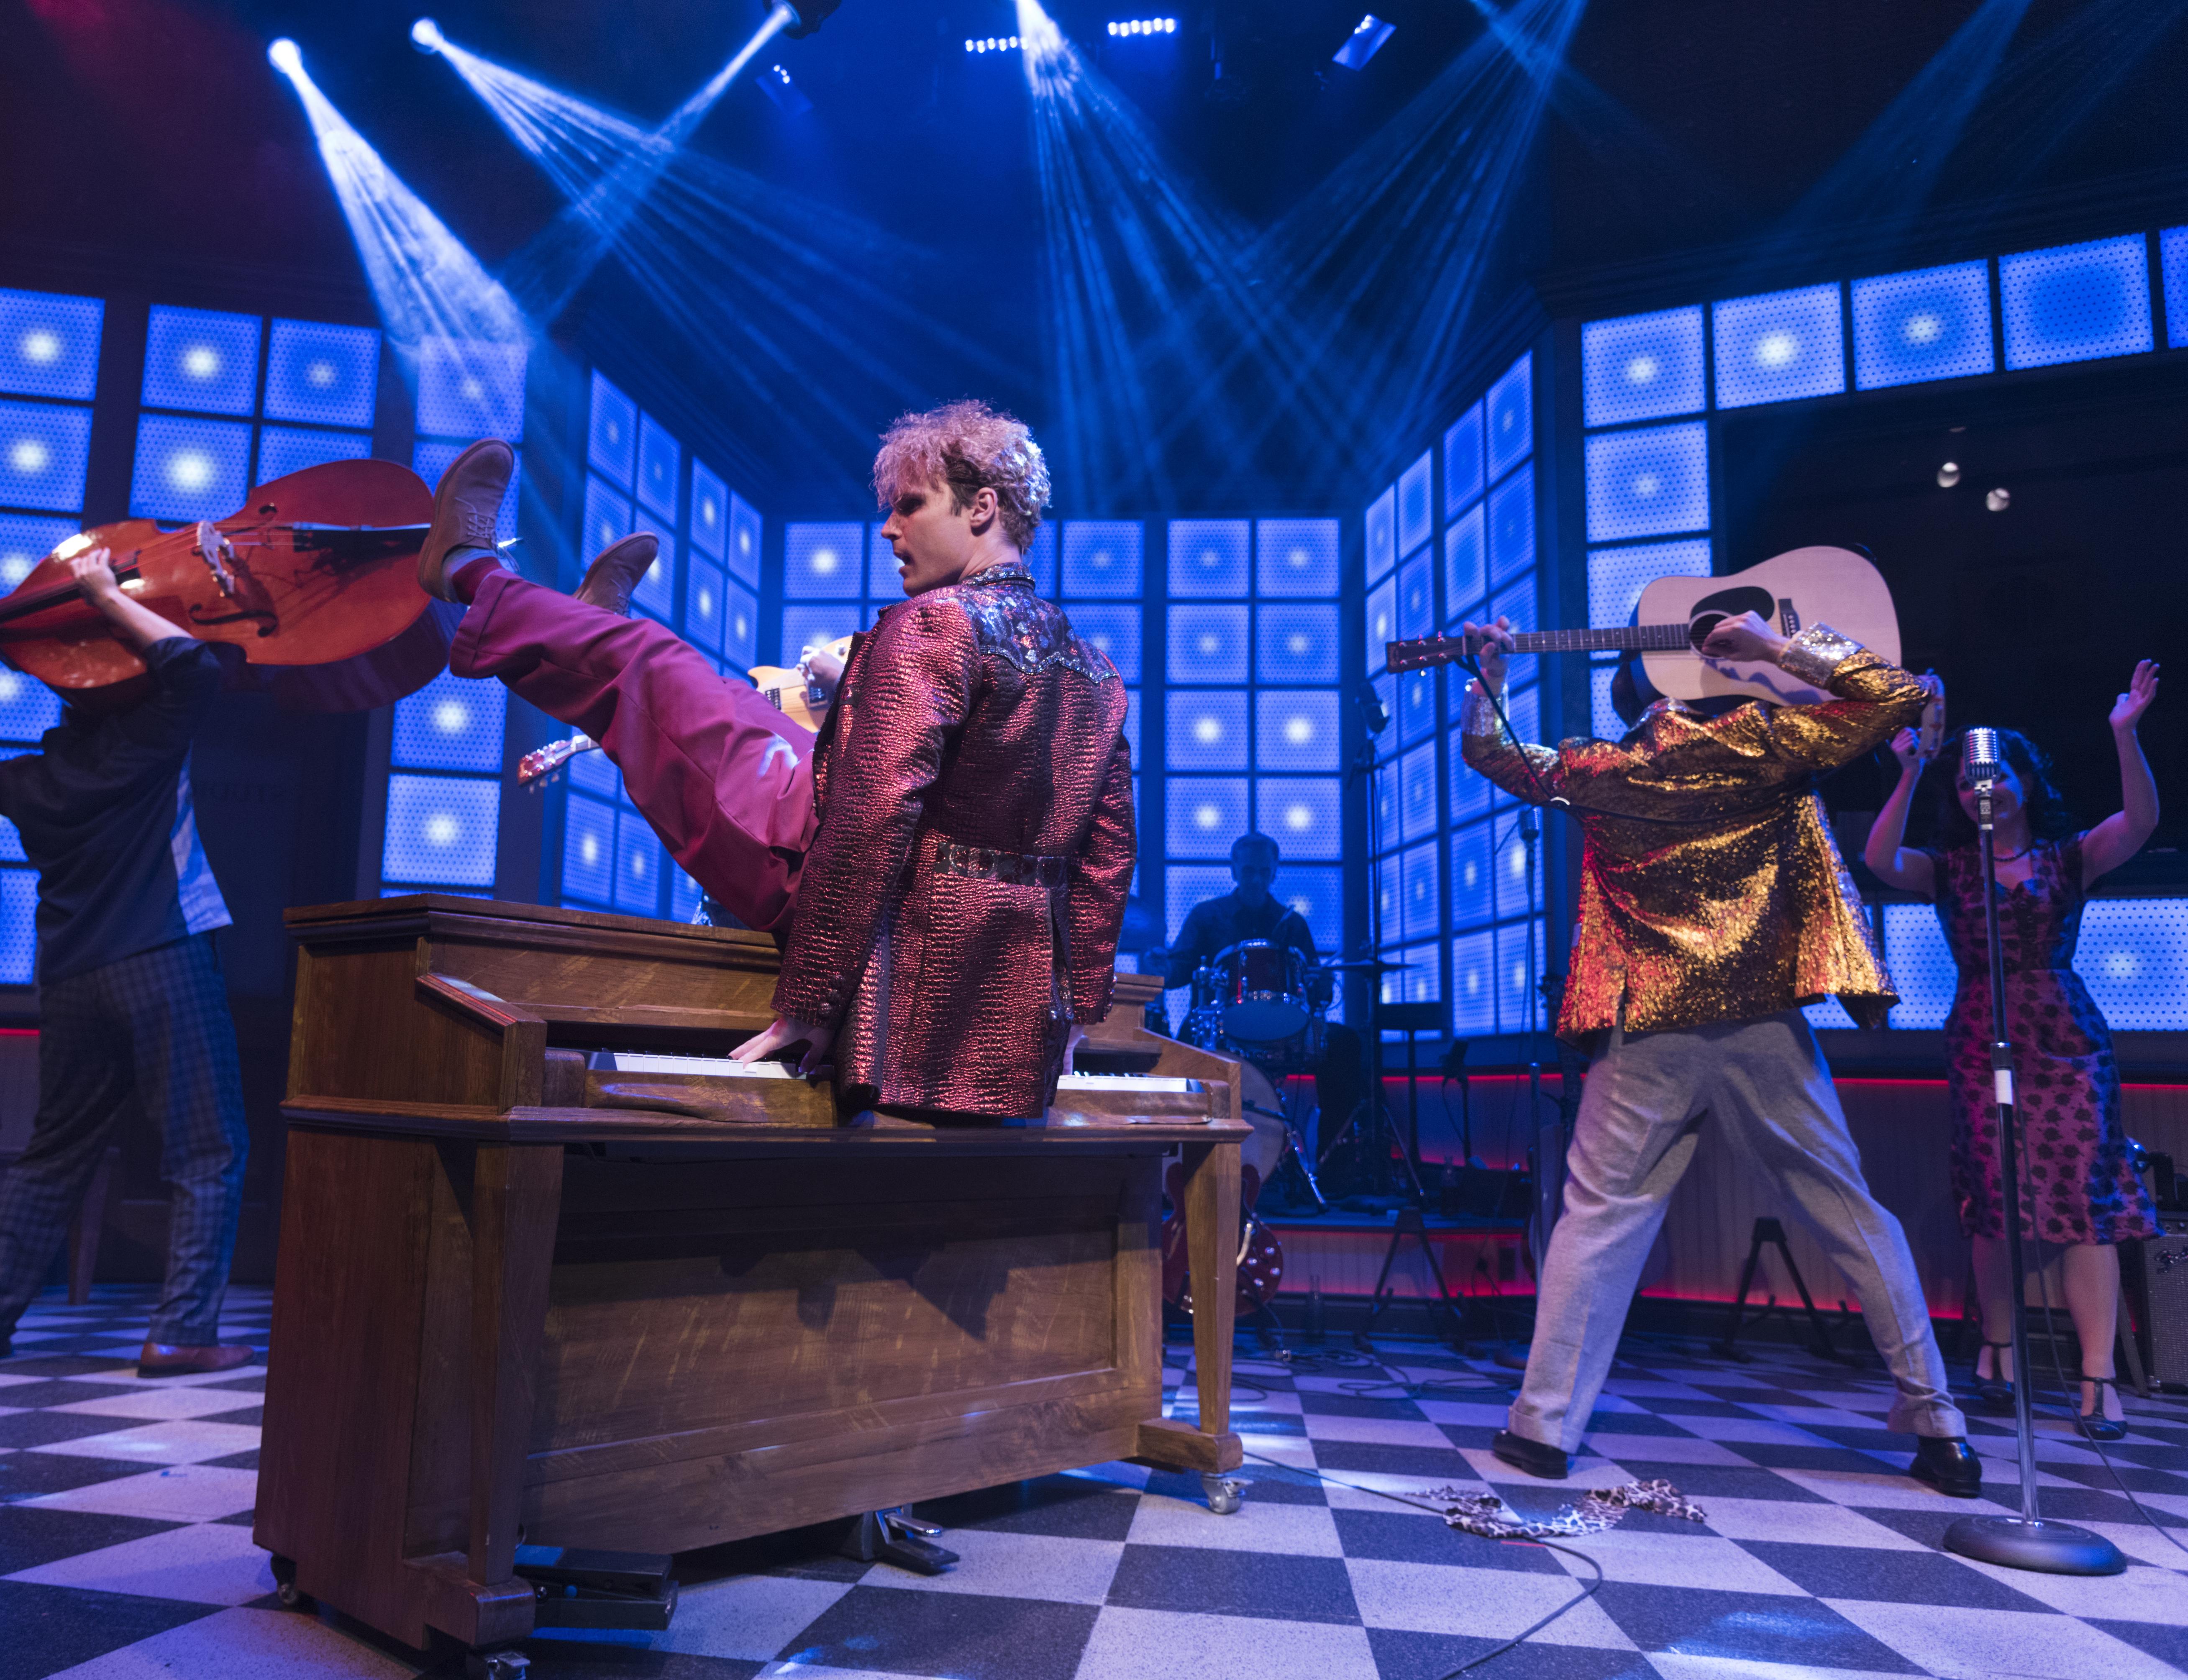 BWW Review: MILLION DOLLAR QUARTET at New Theatre Restaurant